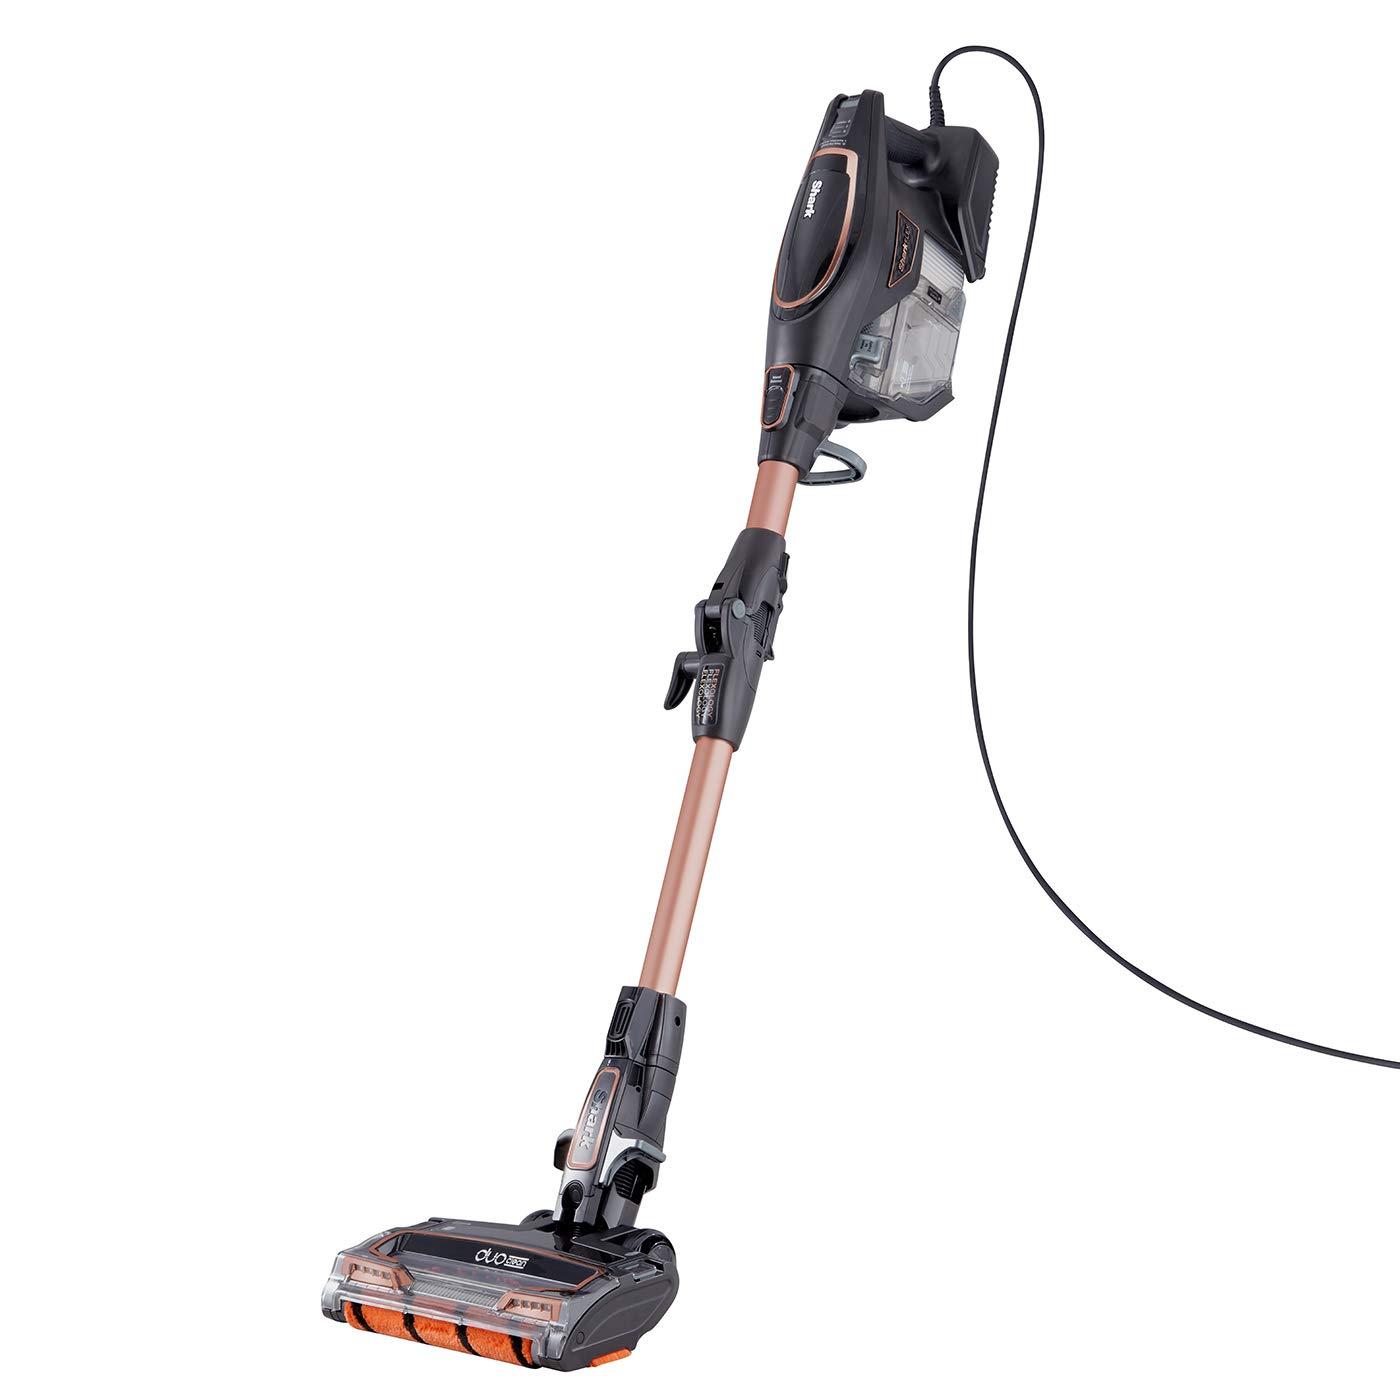 Shark Corded Stick Vacuum Cleaner [HV390UKT] Pet Hair, Lightweight, Rose Gold